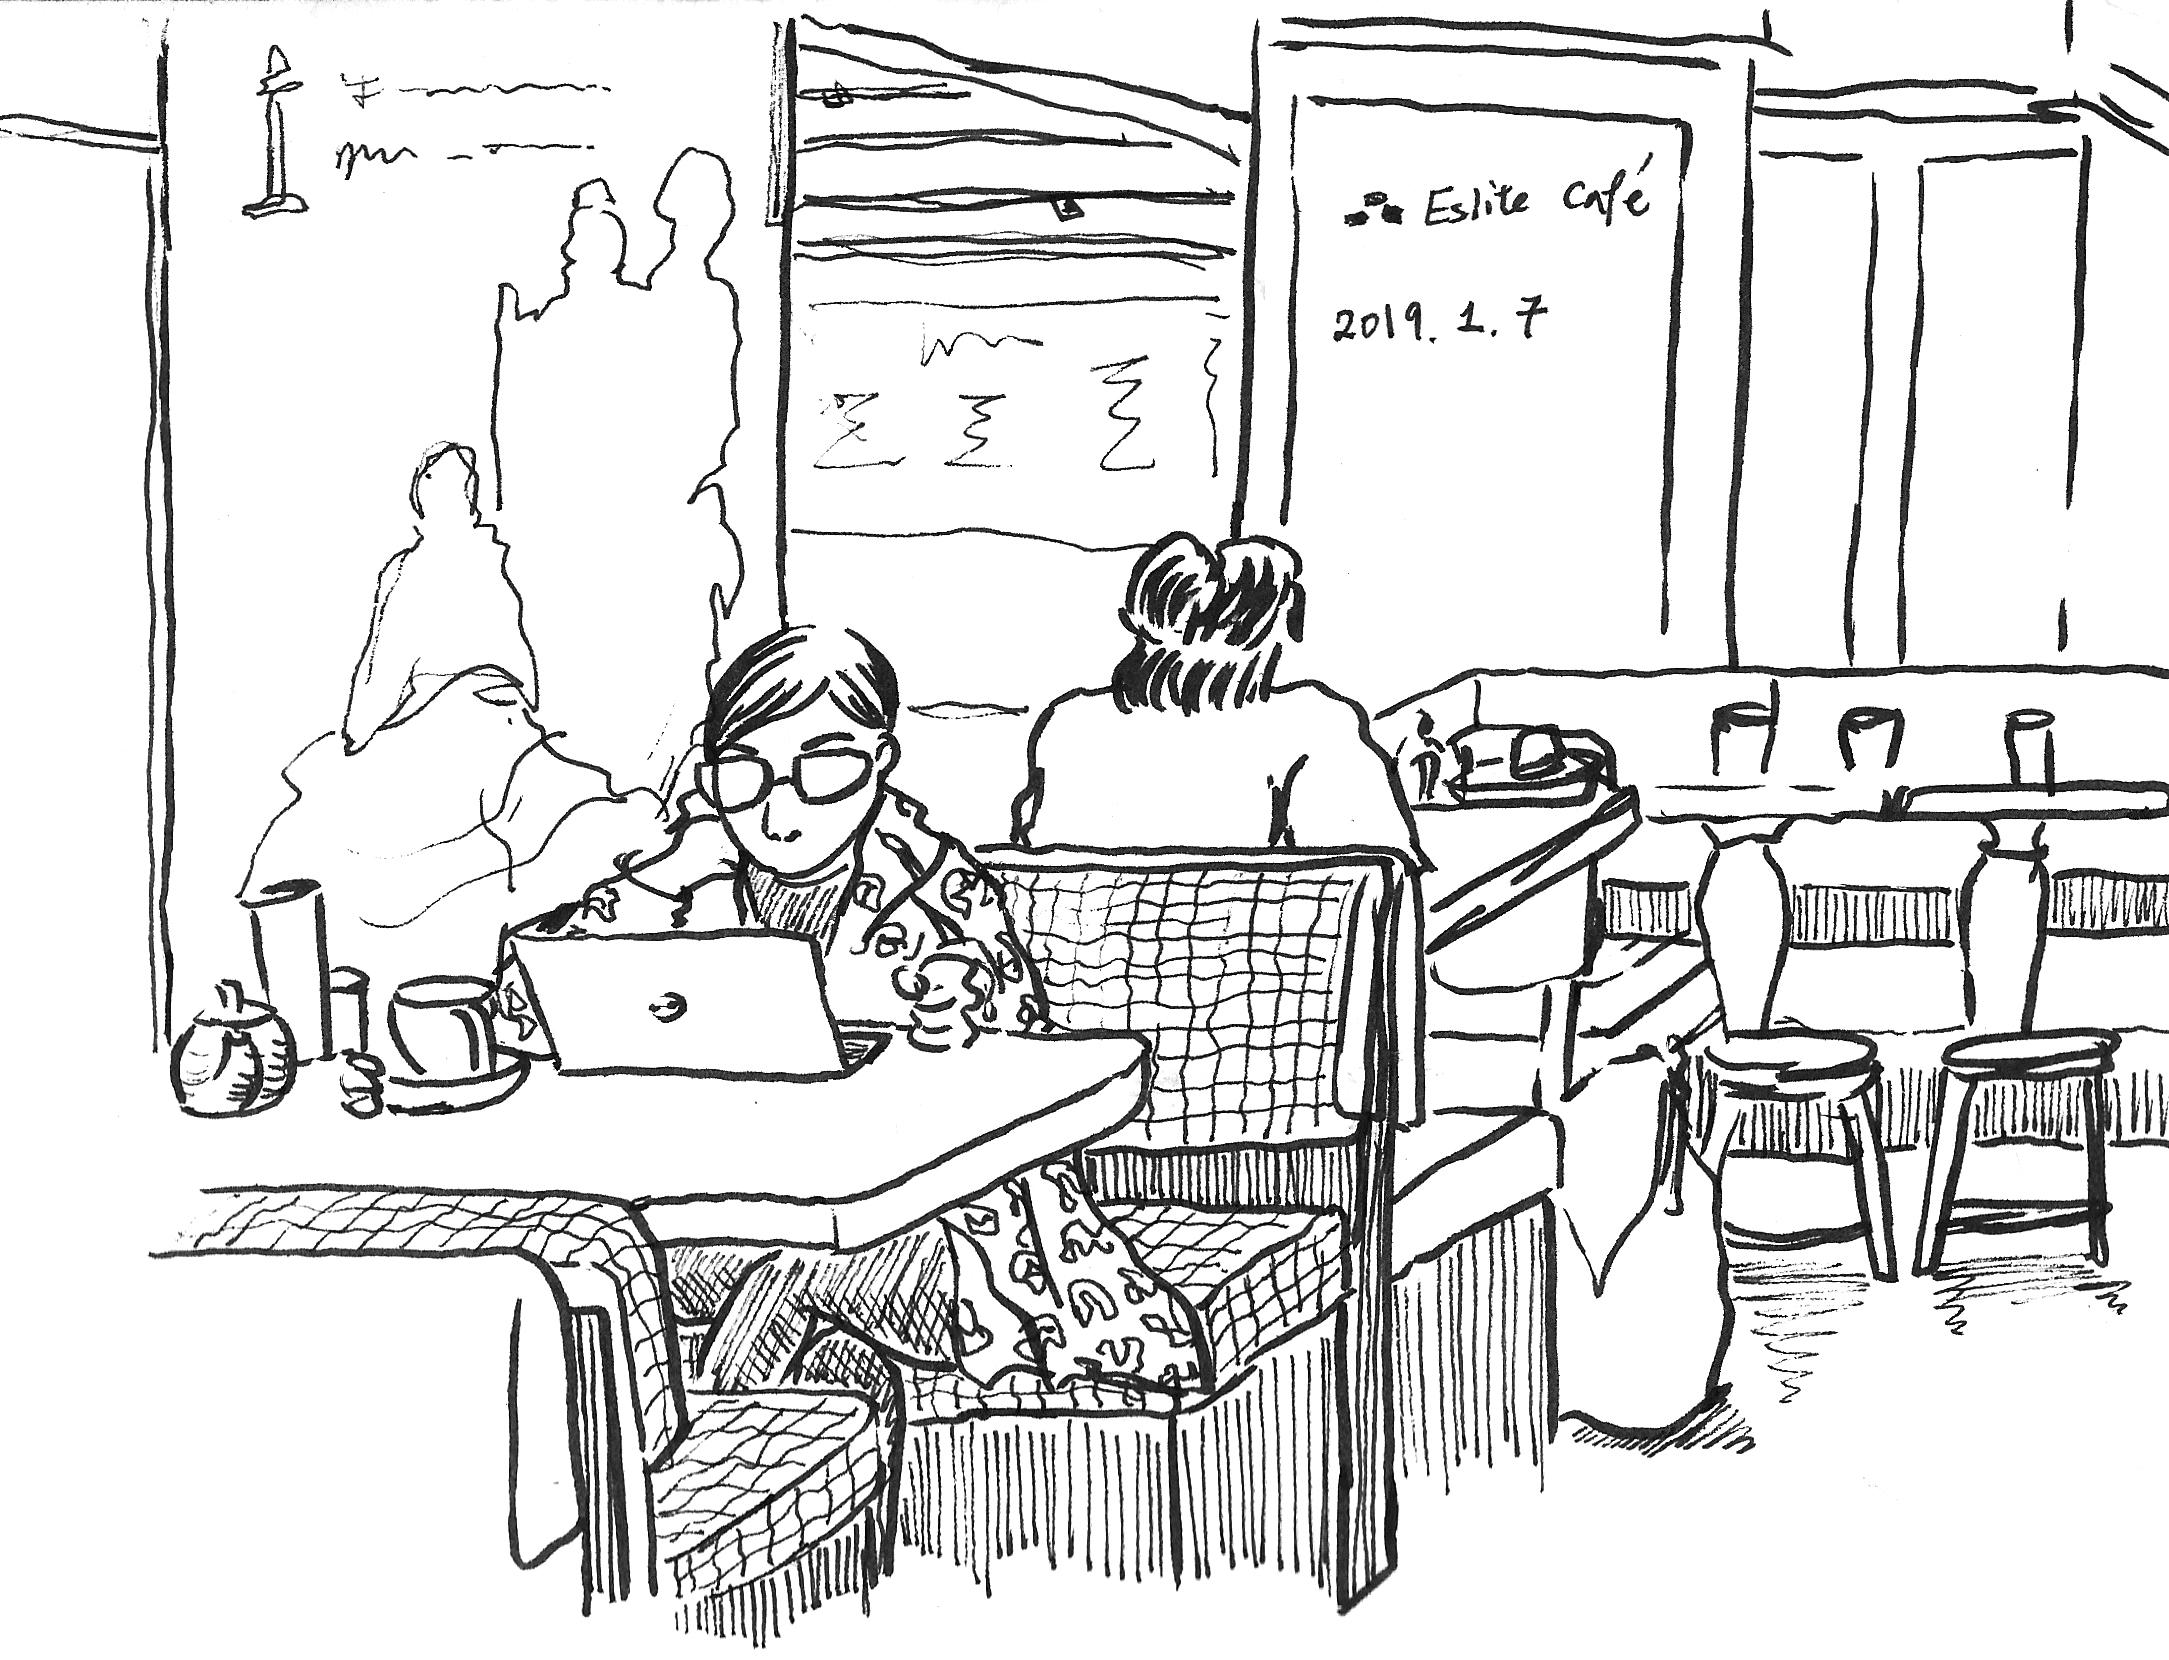 Eslite Cafe